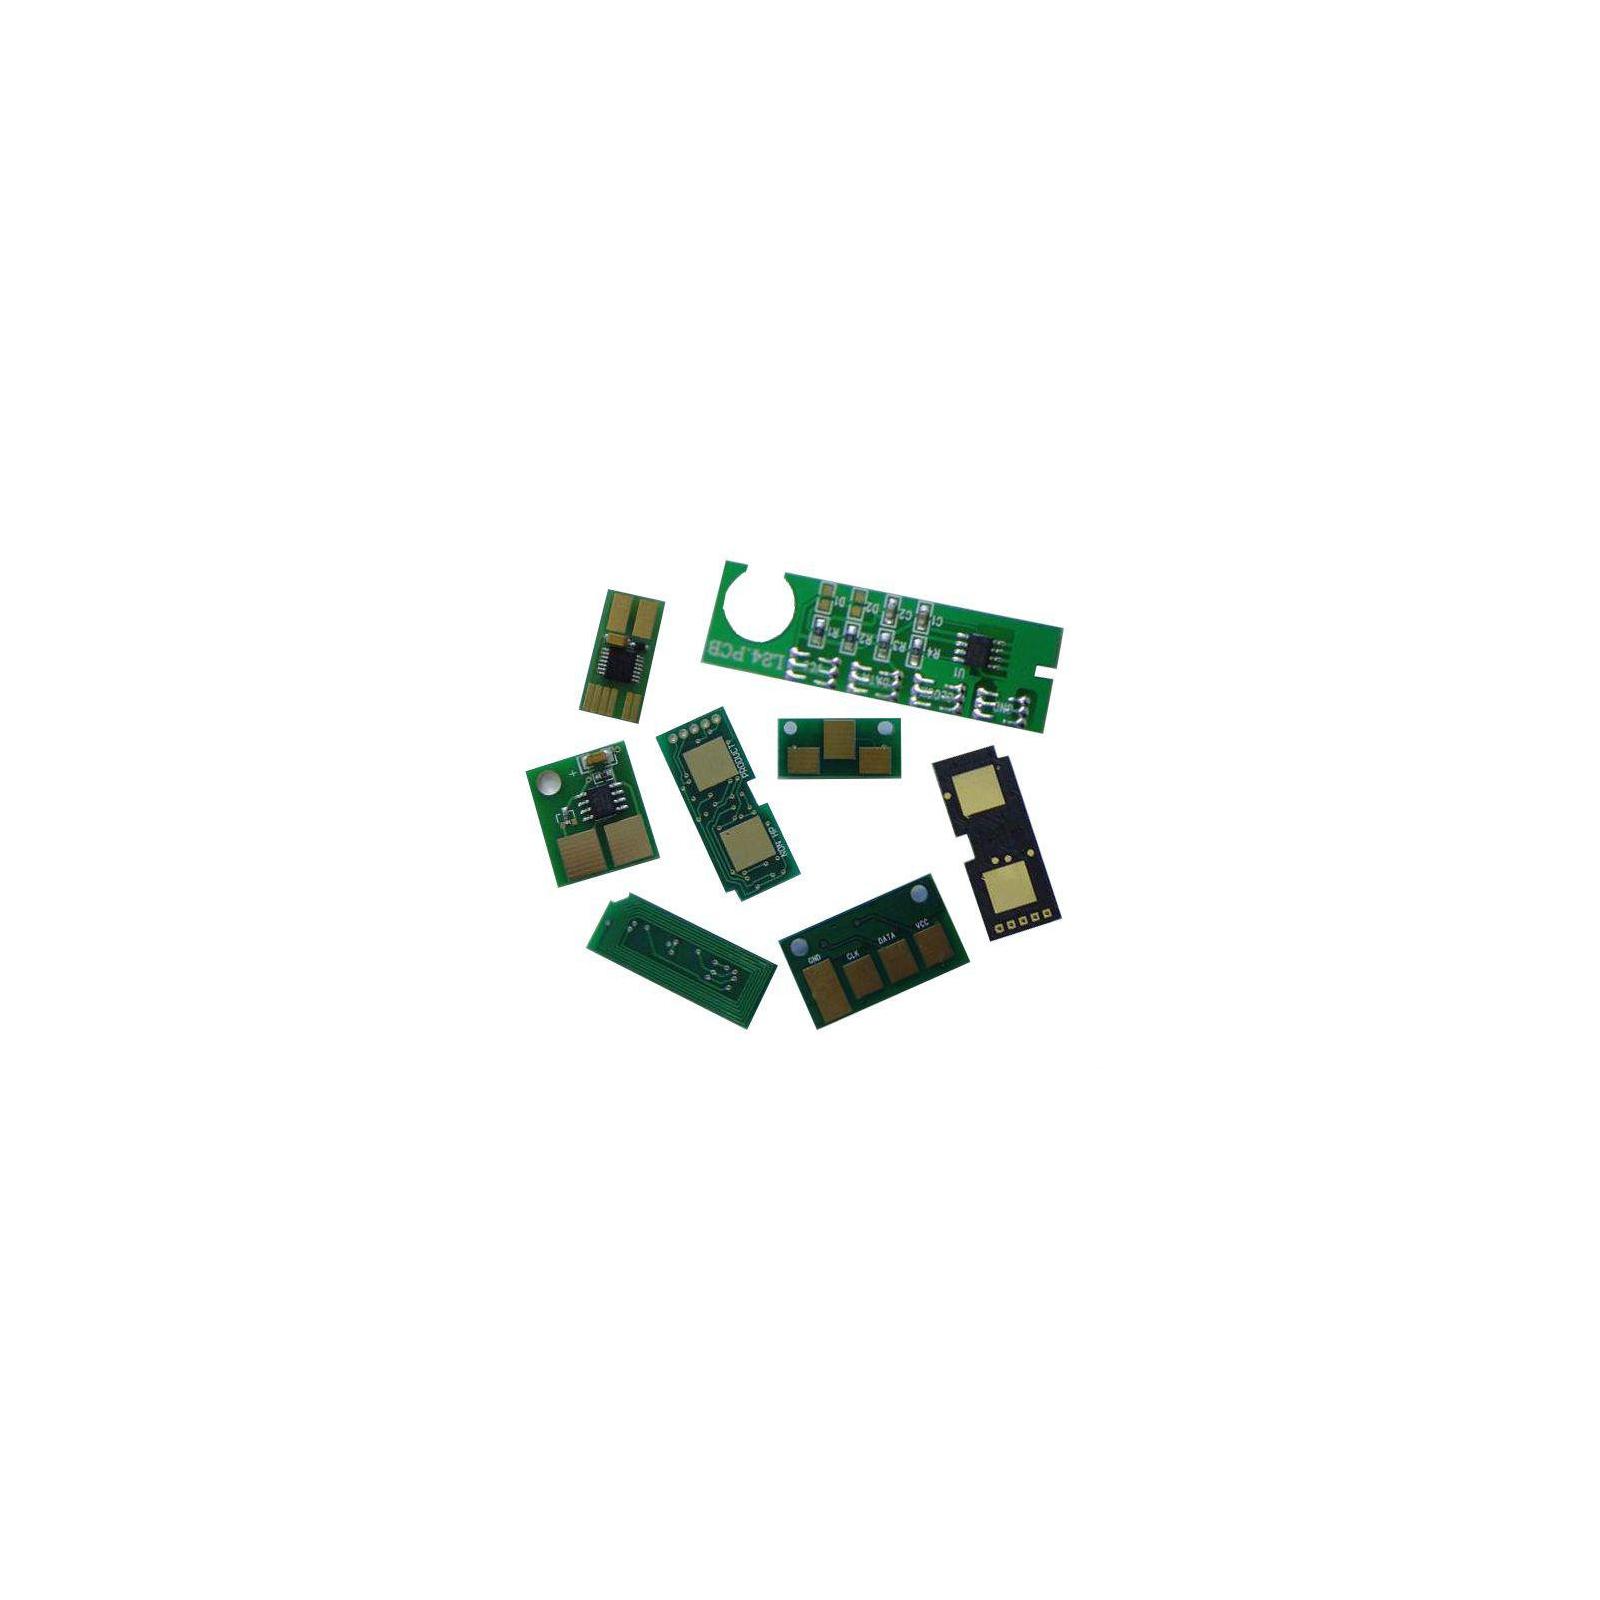 Чип для картриджа CANON 054 ДЛЯ MF642 1.2K CYAN Everprint (CHIP-CAN-054-C)